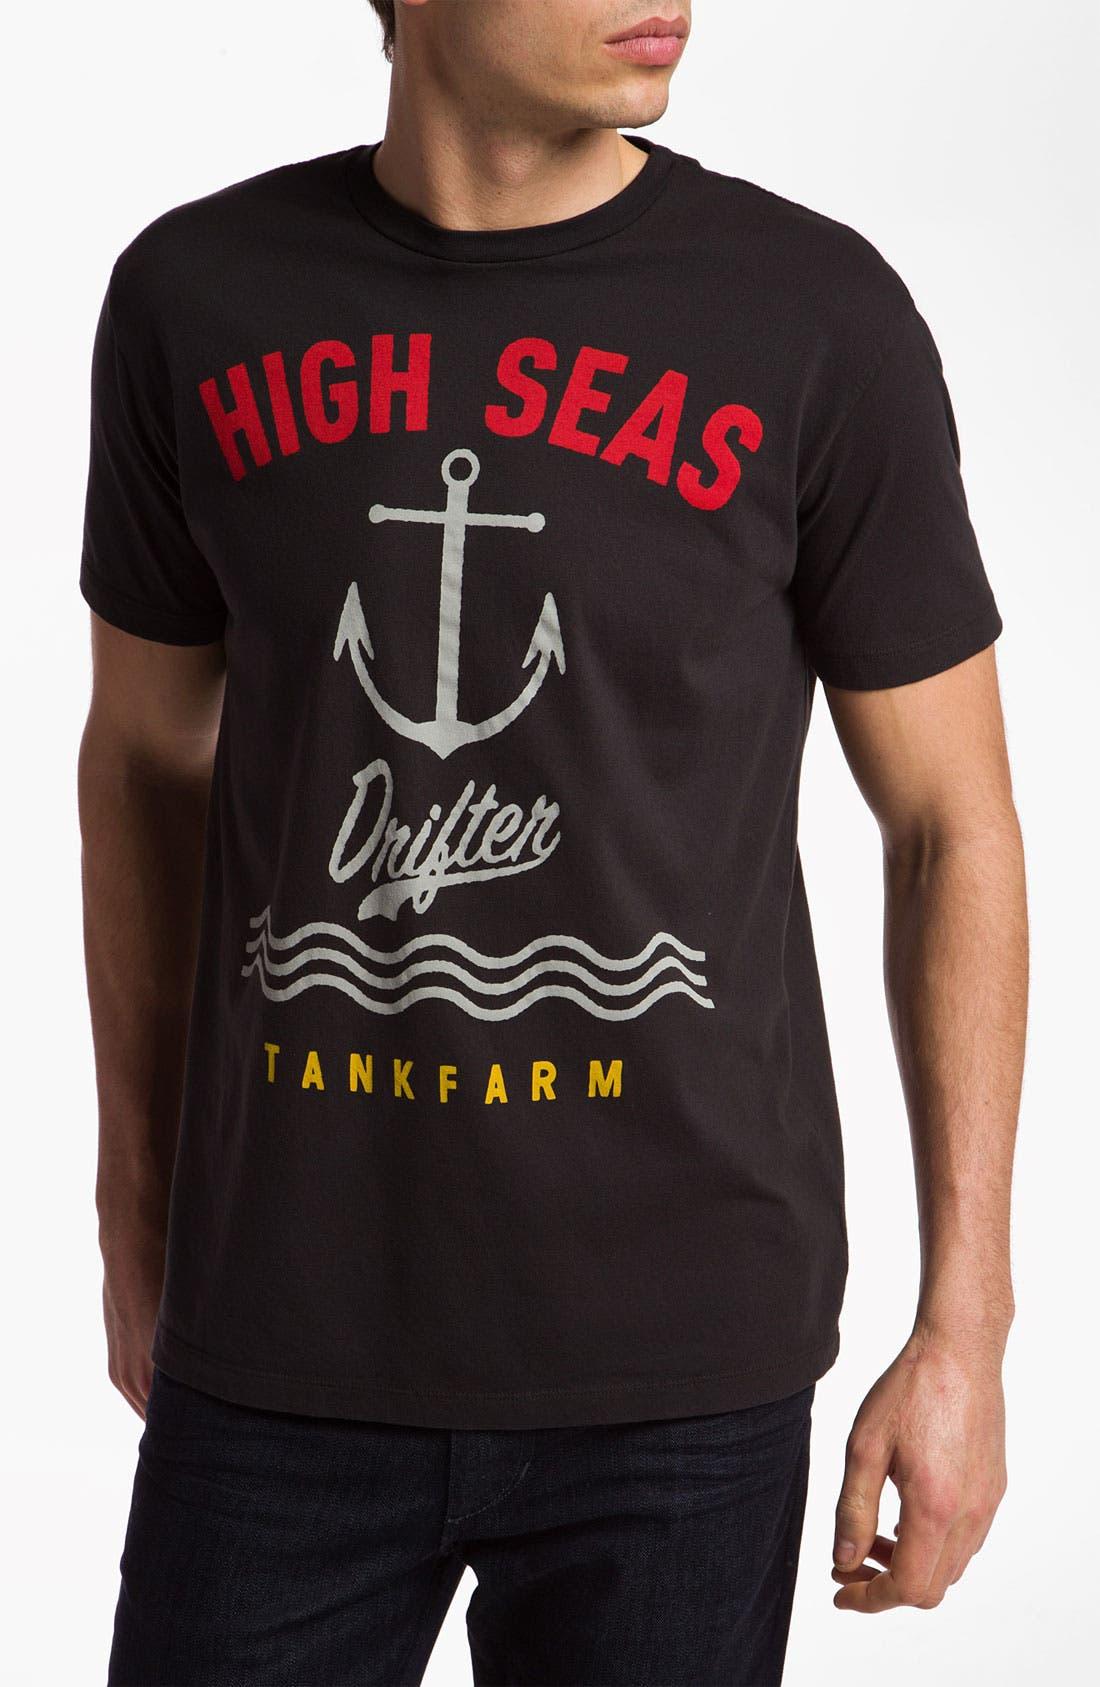 Main Image - Tankfarm 'High Seas Drifter' Graphic T-Shirt